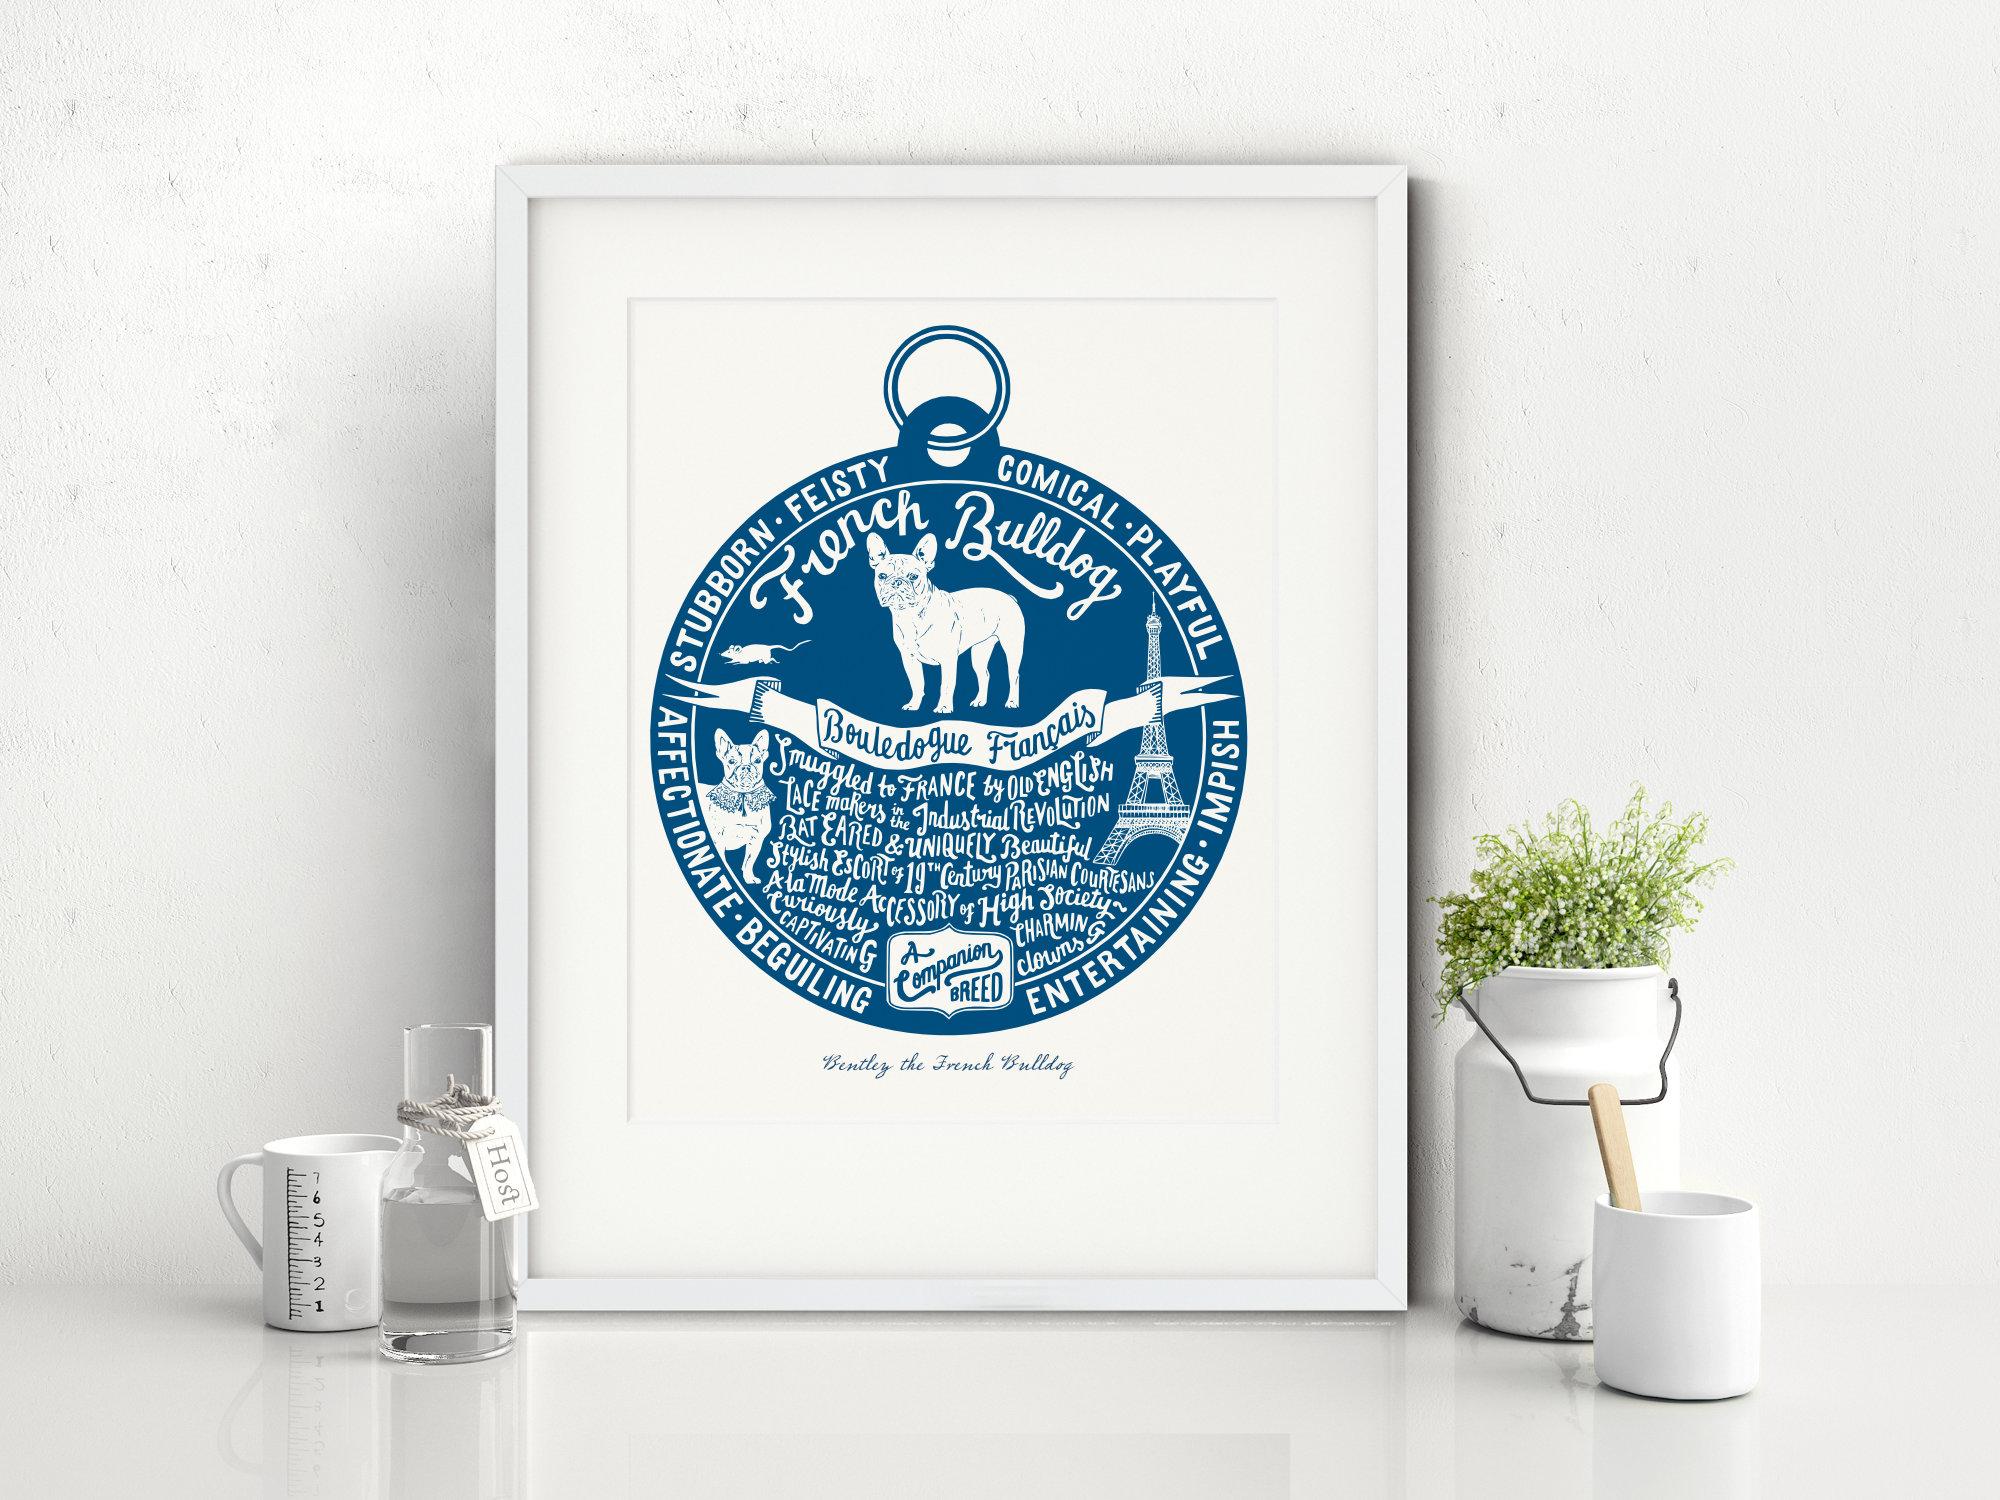 French Bulldog Dog Art Print | The Enlightened Hound